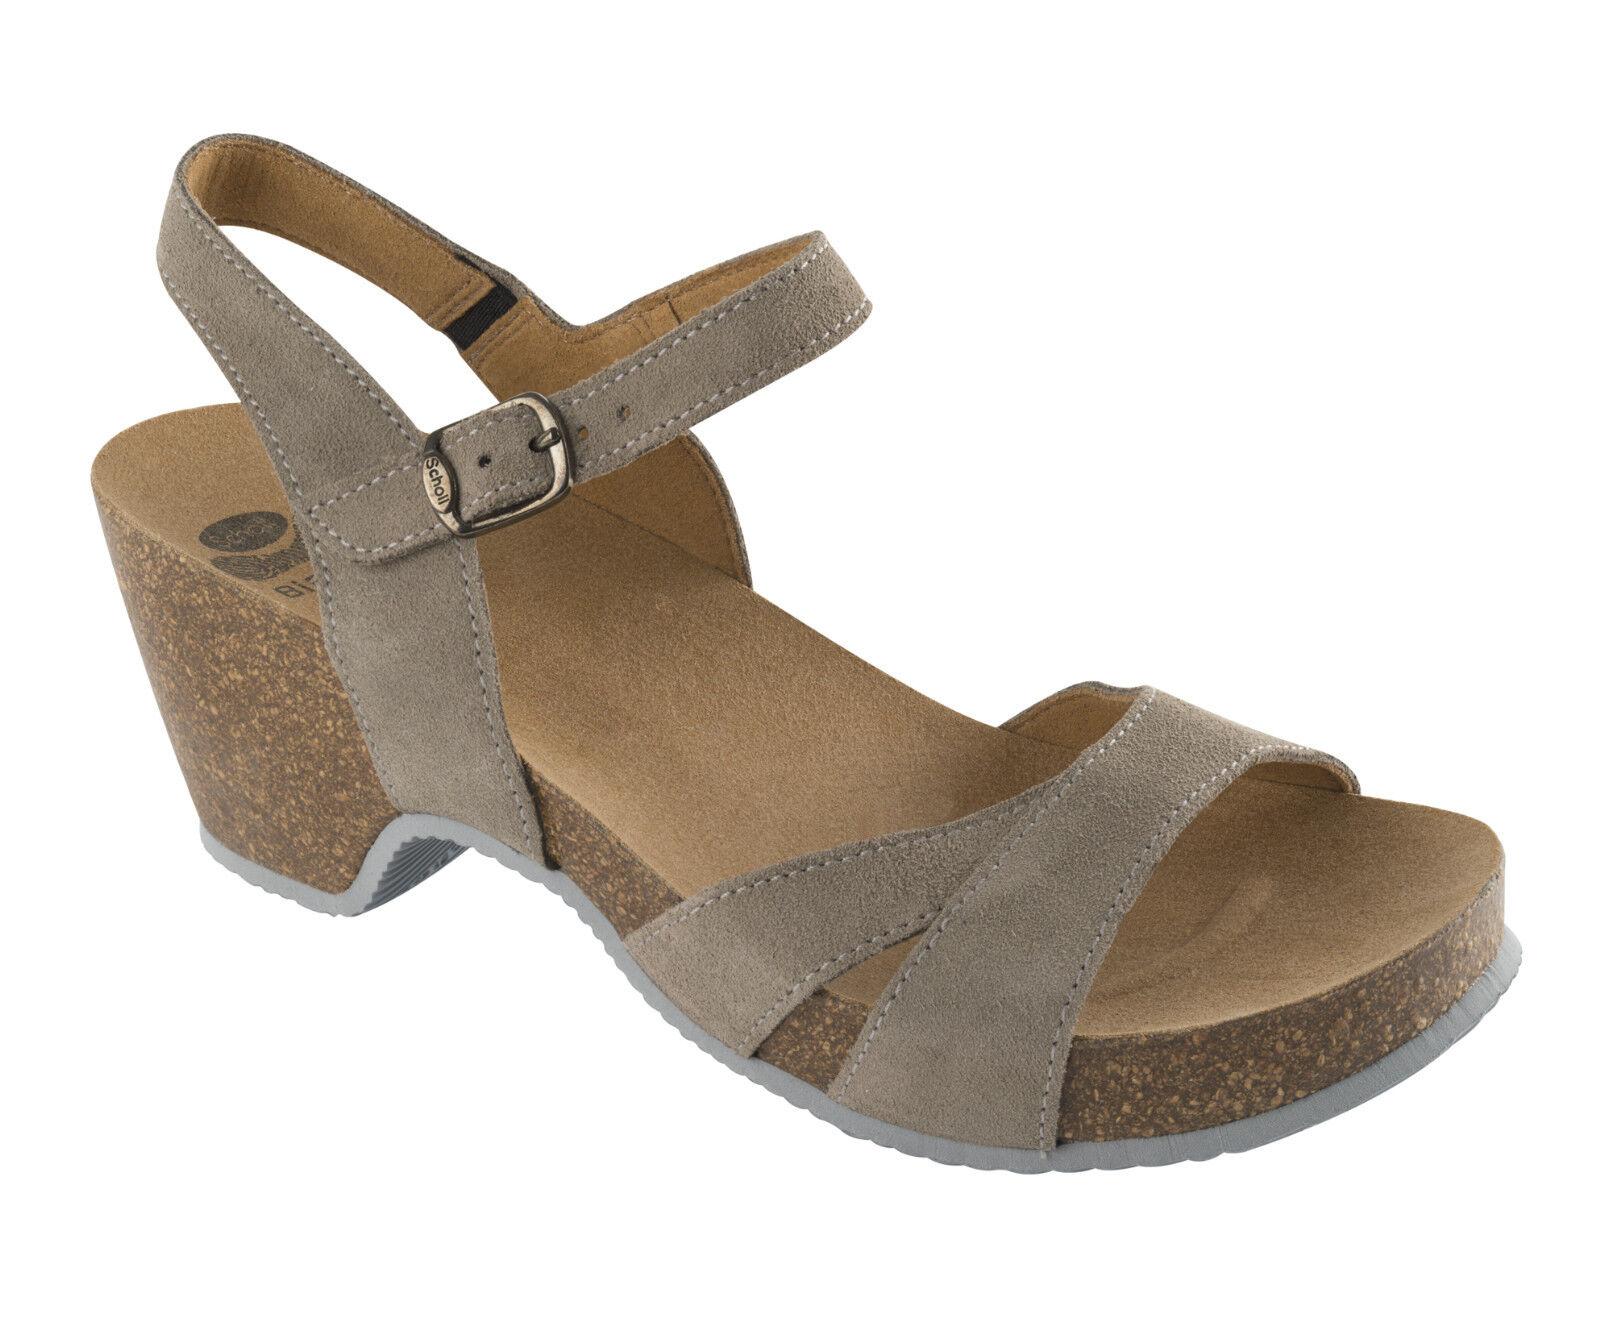 DR SCHOLL KATIE SUEDE donna sandali zoccoli ciabatte infradito donna SUEDE zeppa camoscio 39fa87